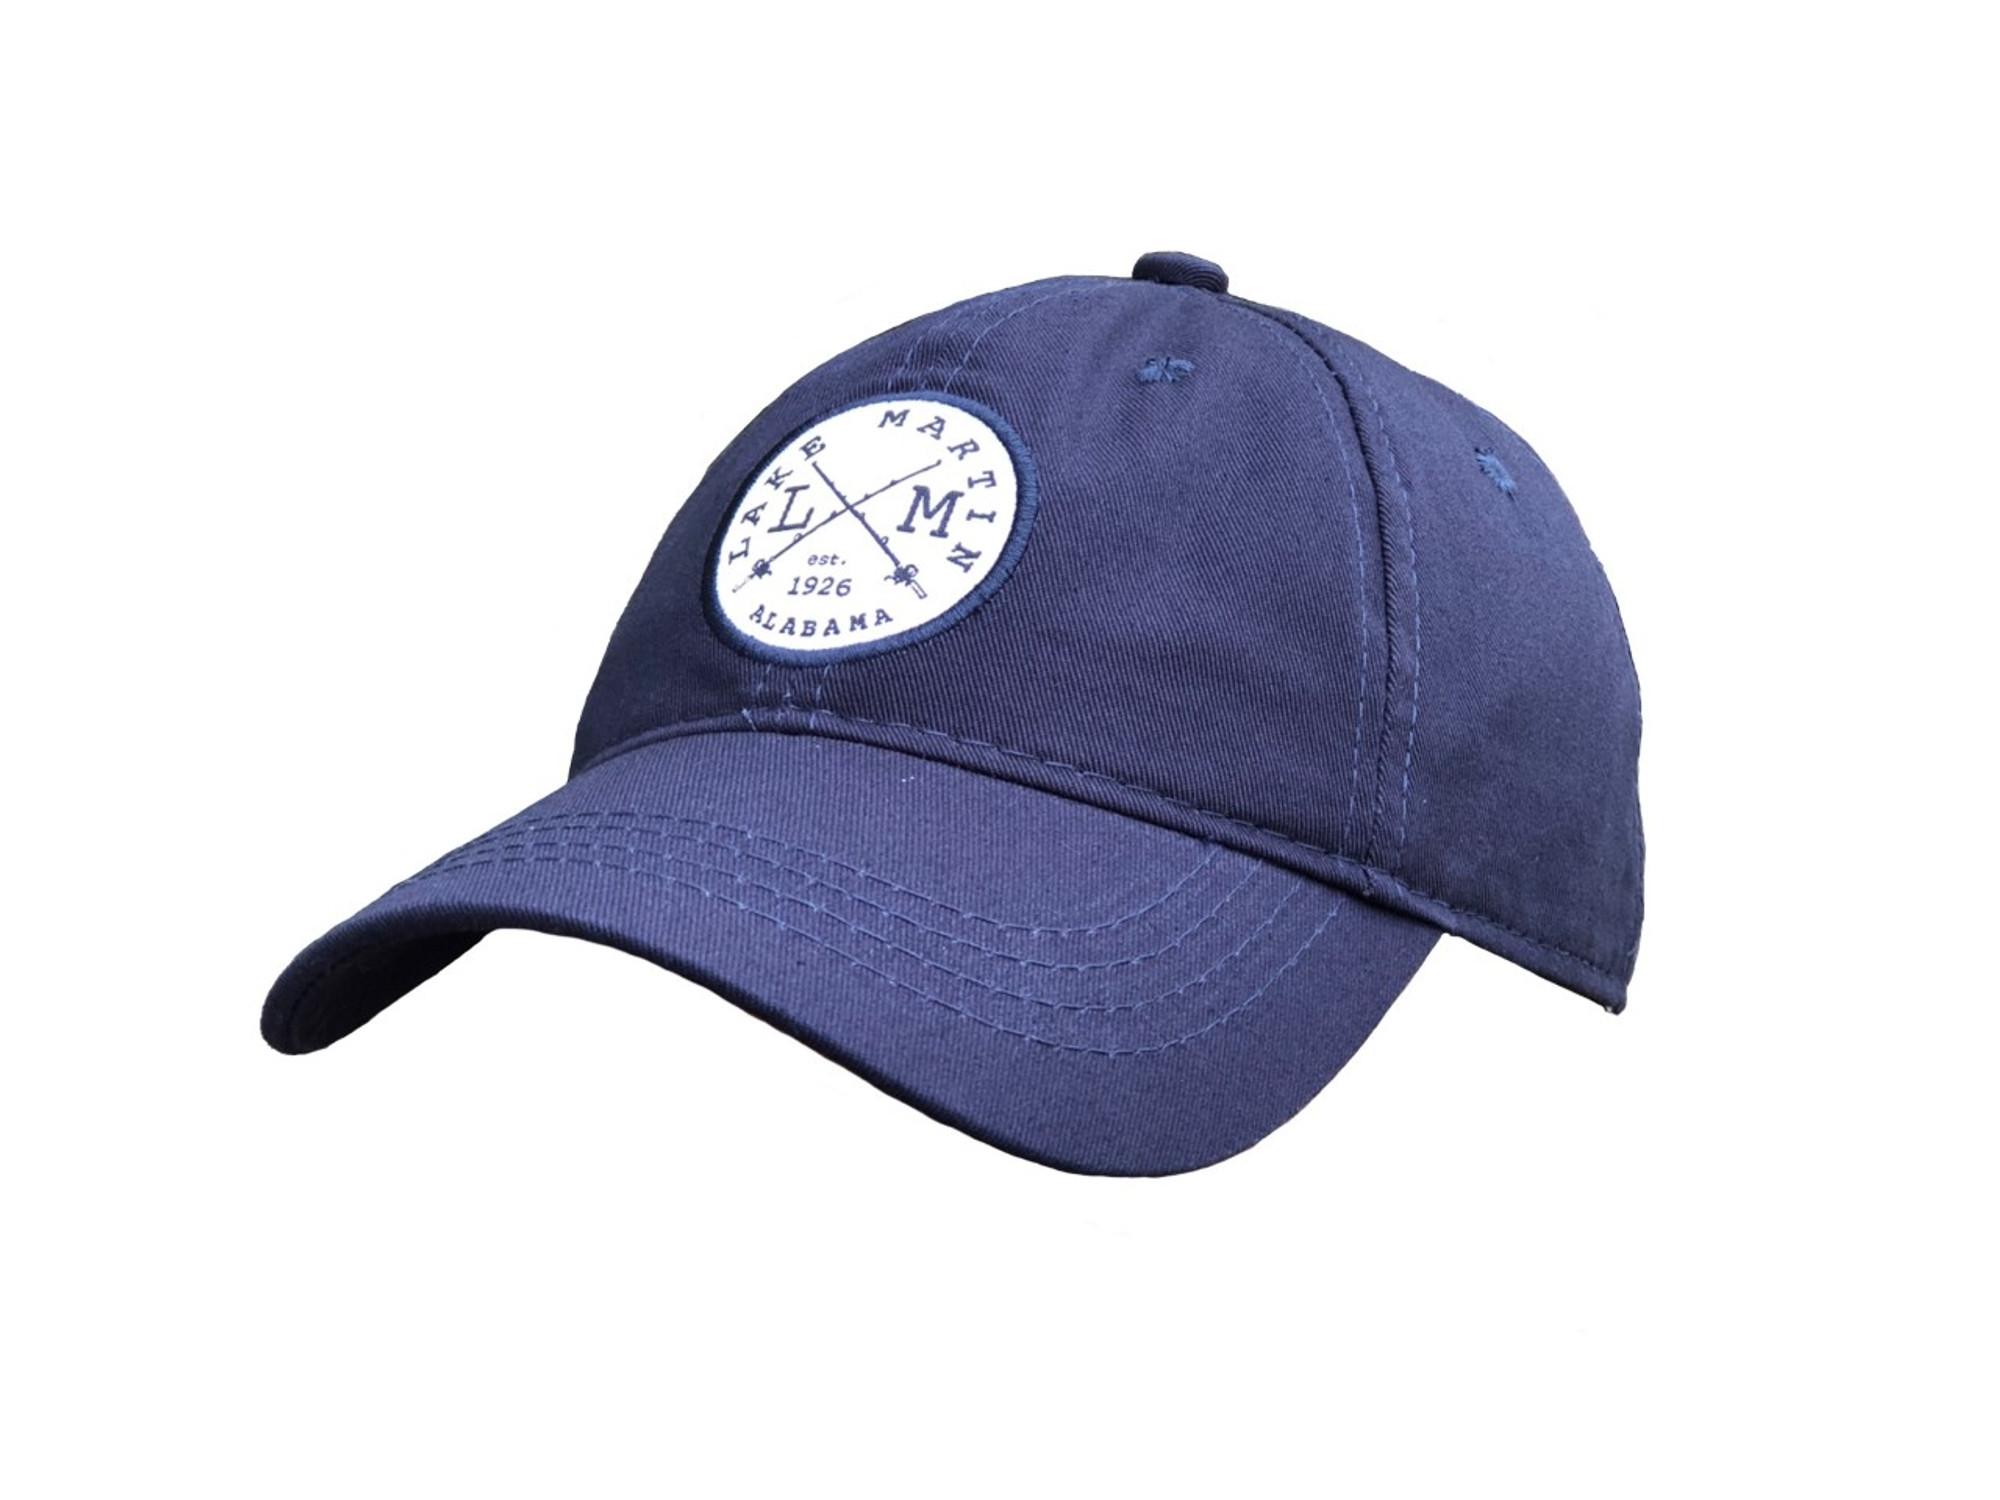 d1b1e01ad Lake Martin Navy Blue Hat - Mikes Merchandise